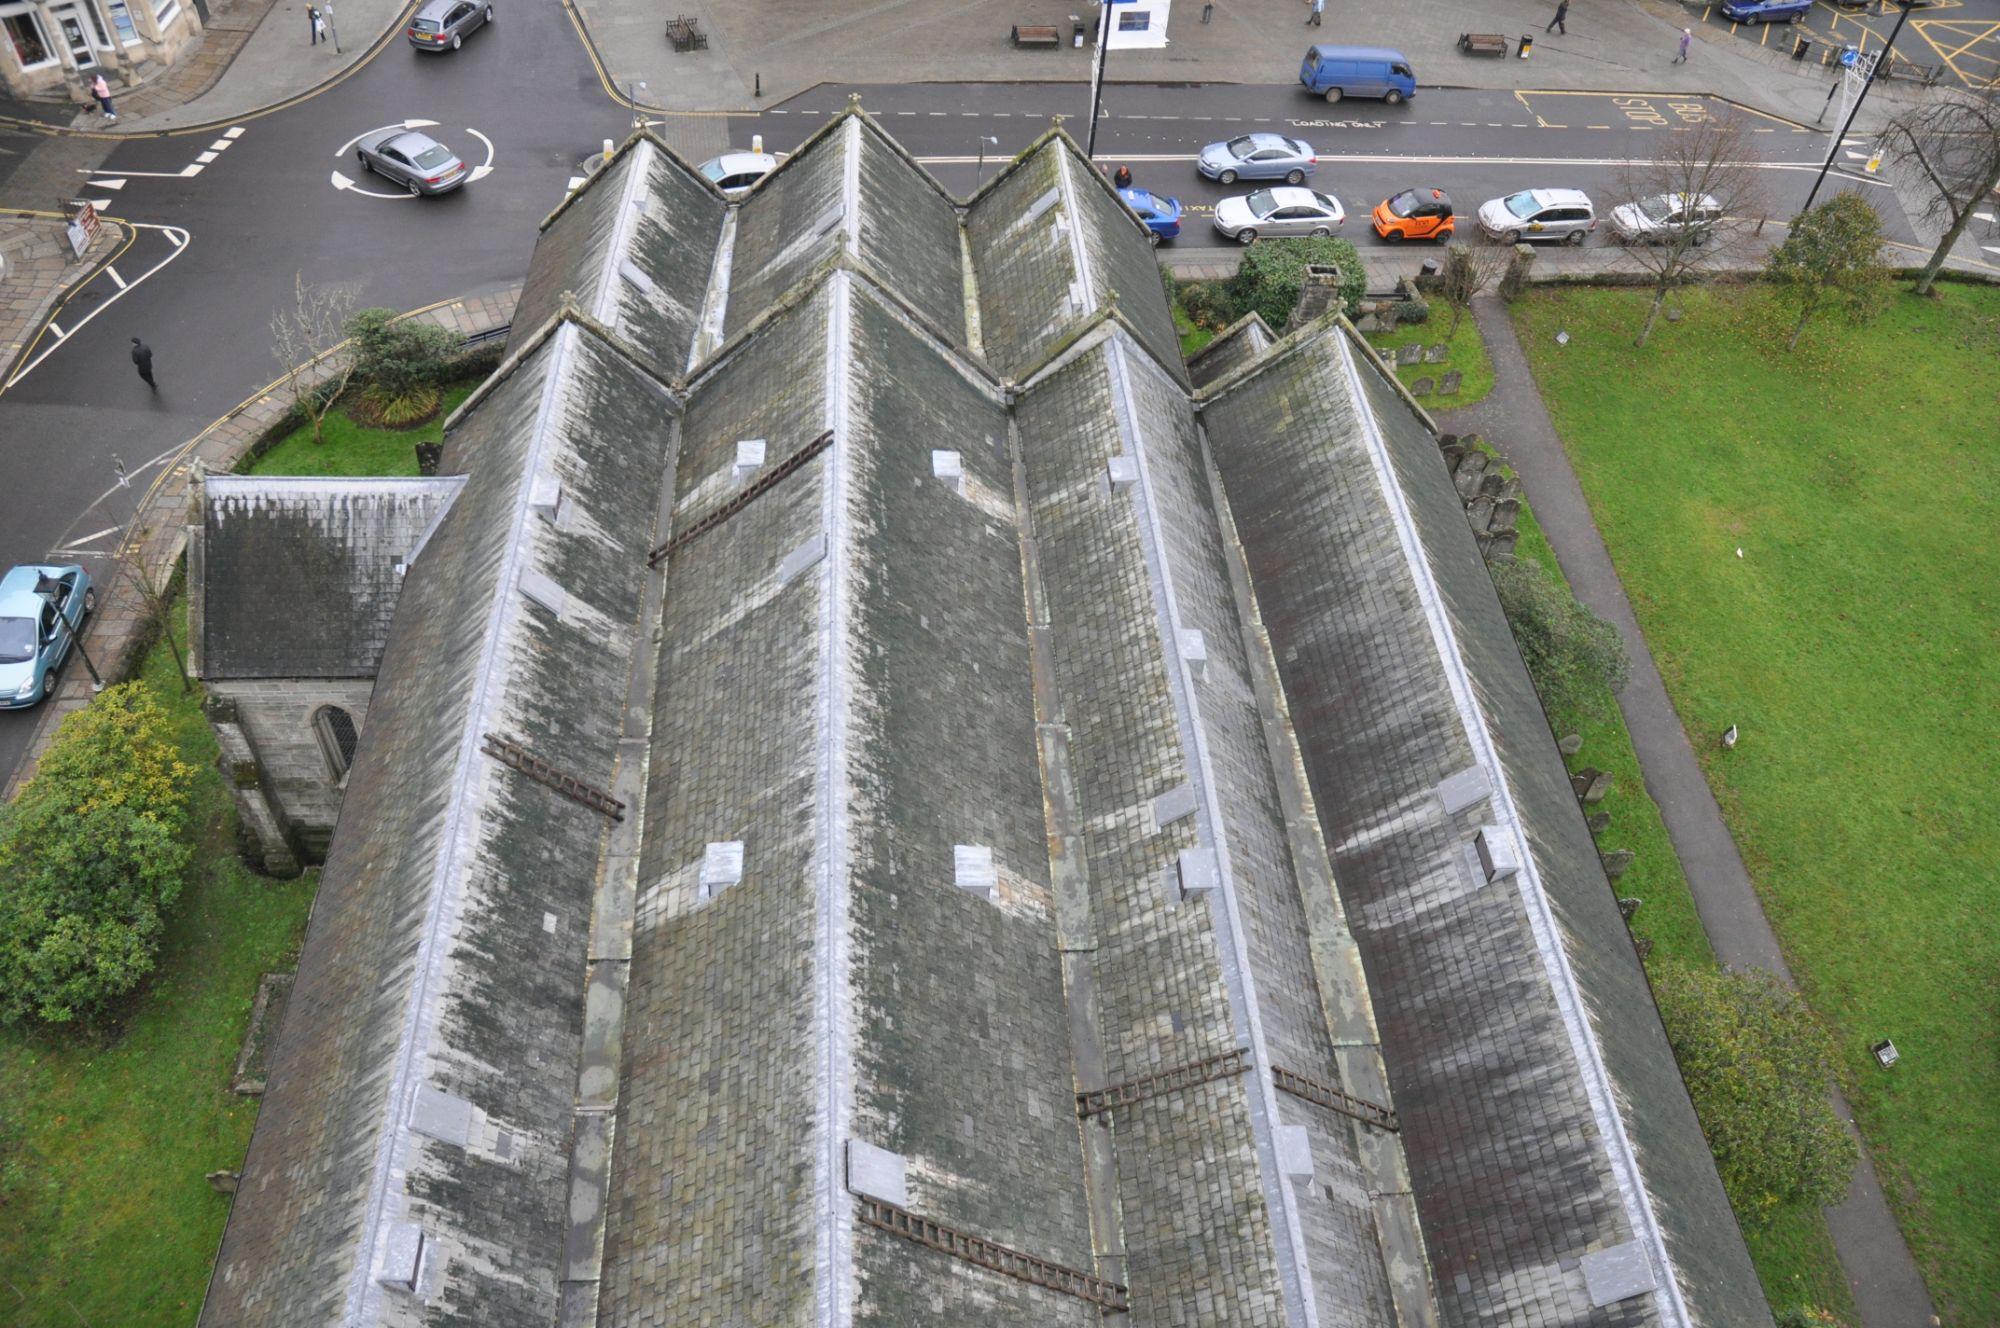 Church roof survey, Tavistock, Devon